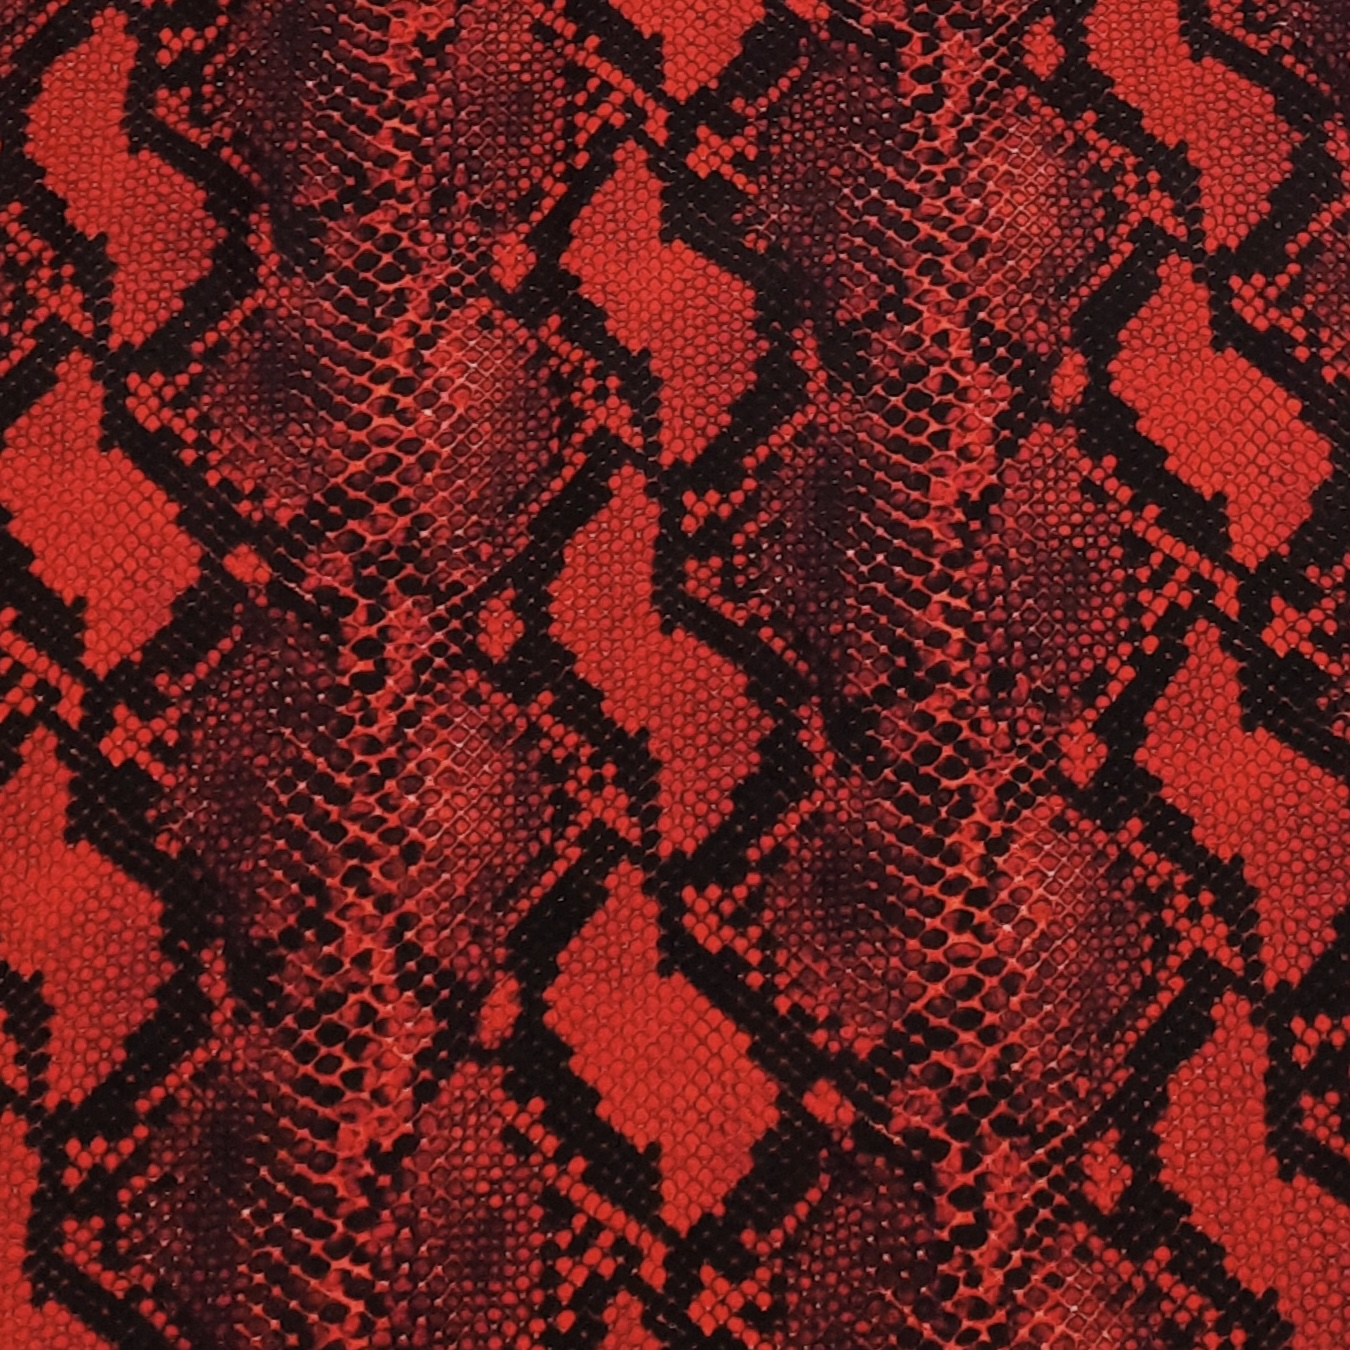 red-snakeskincropped.jpg